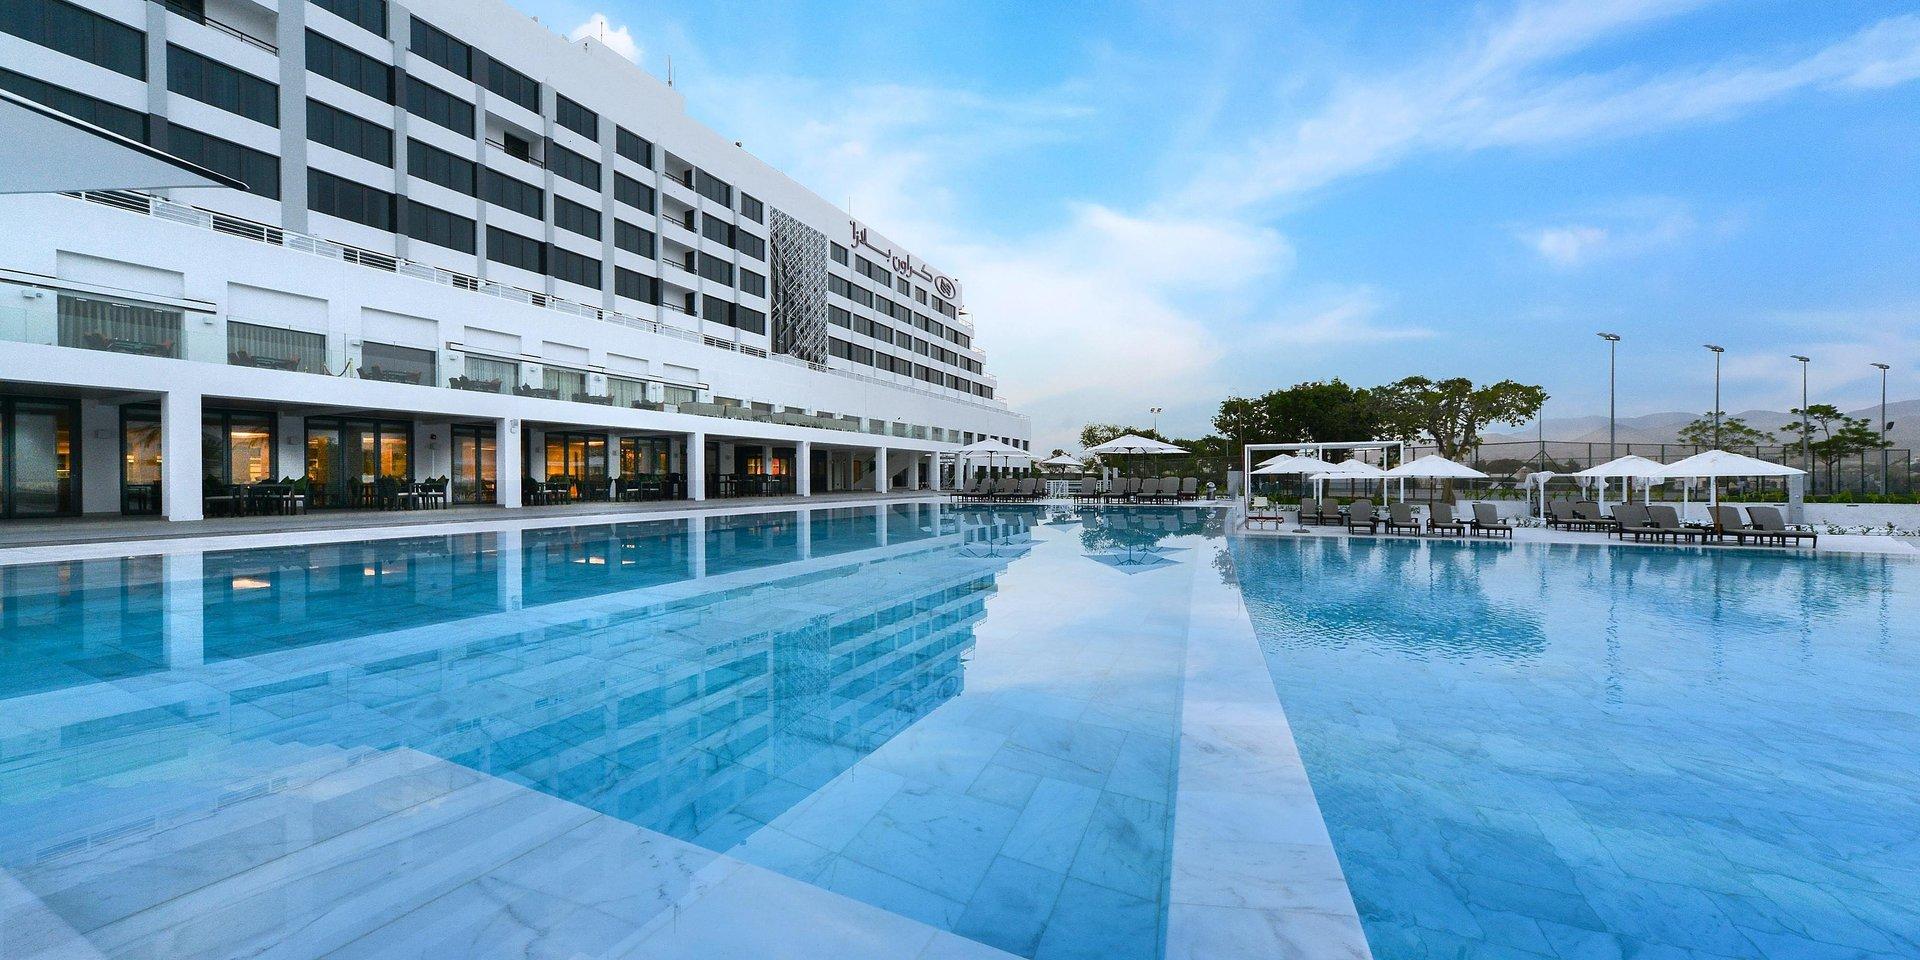 Hotel Crowne Plaza Muscat zwembad - Muscat